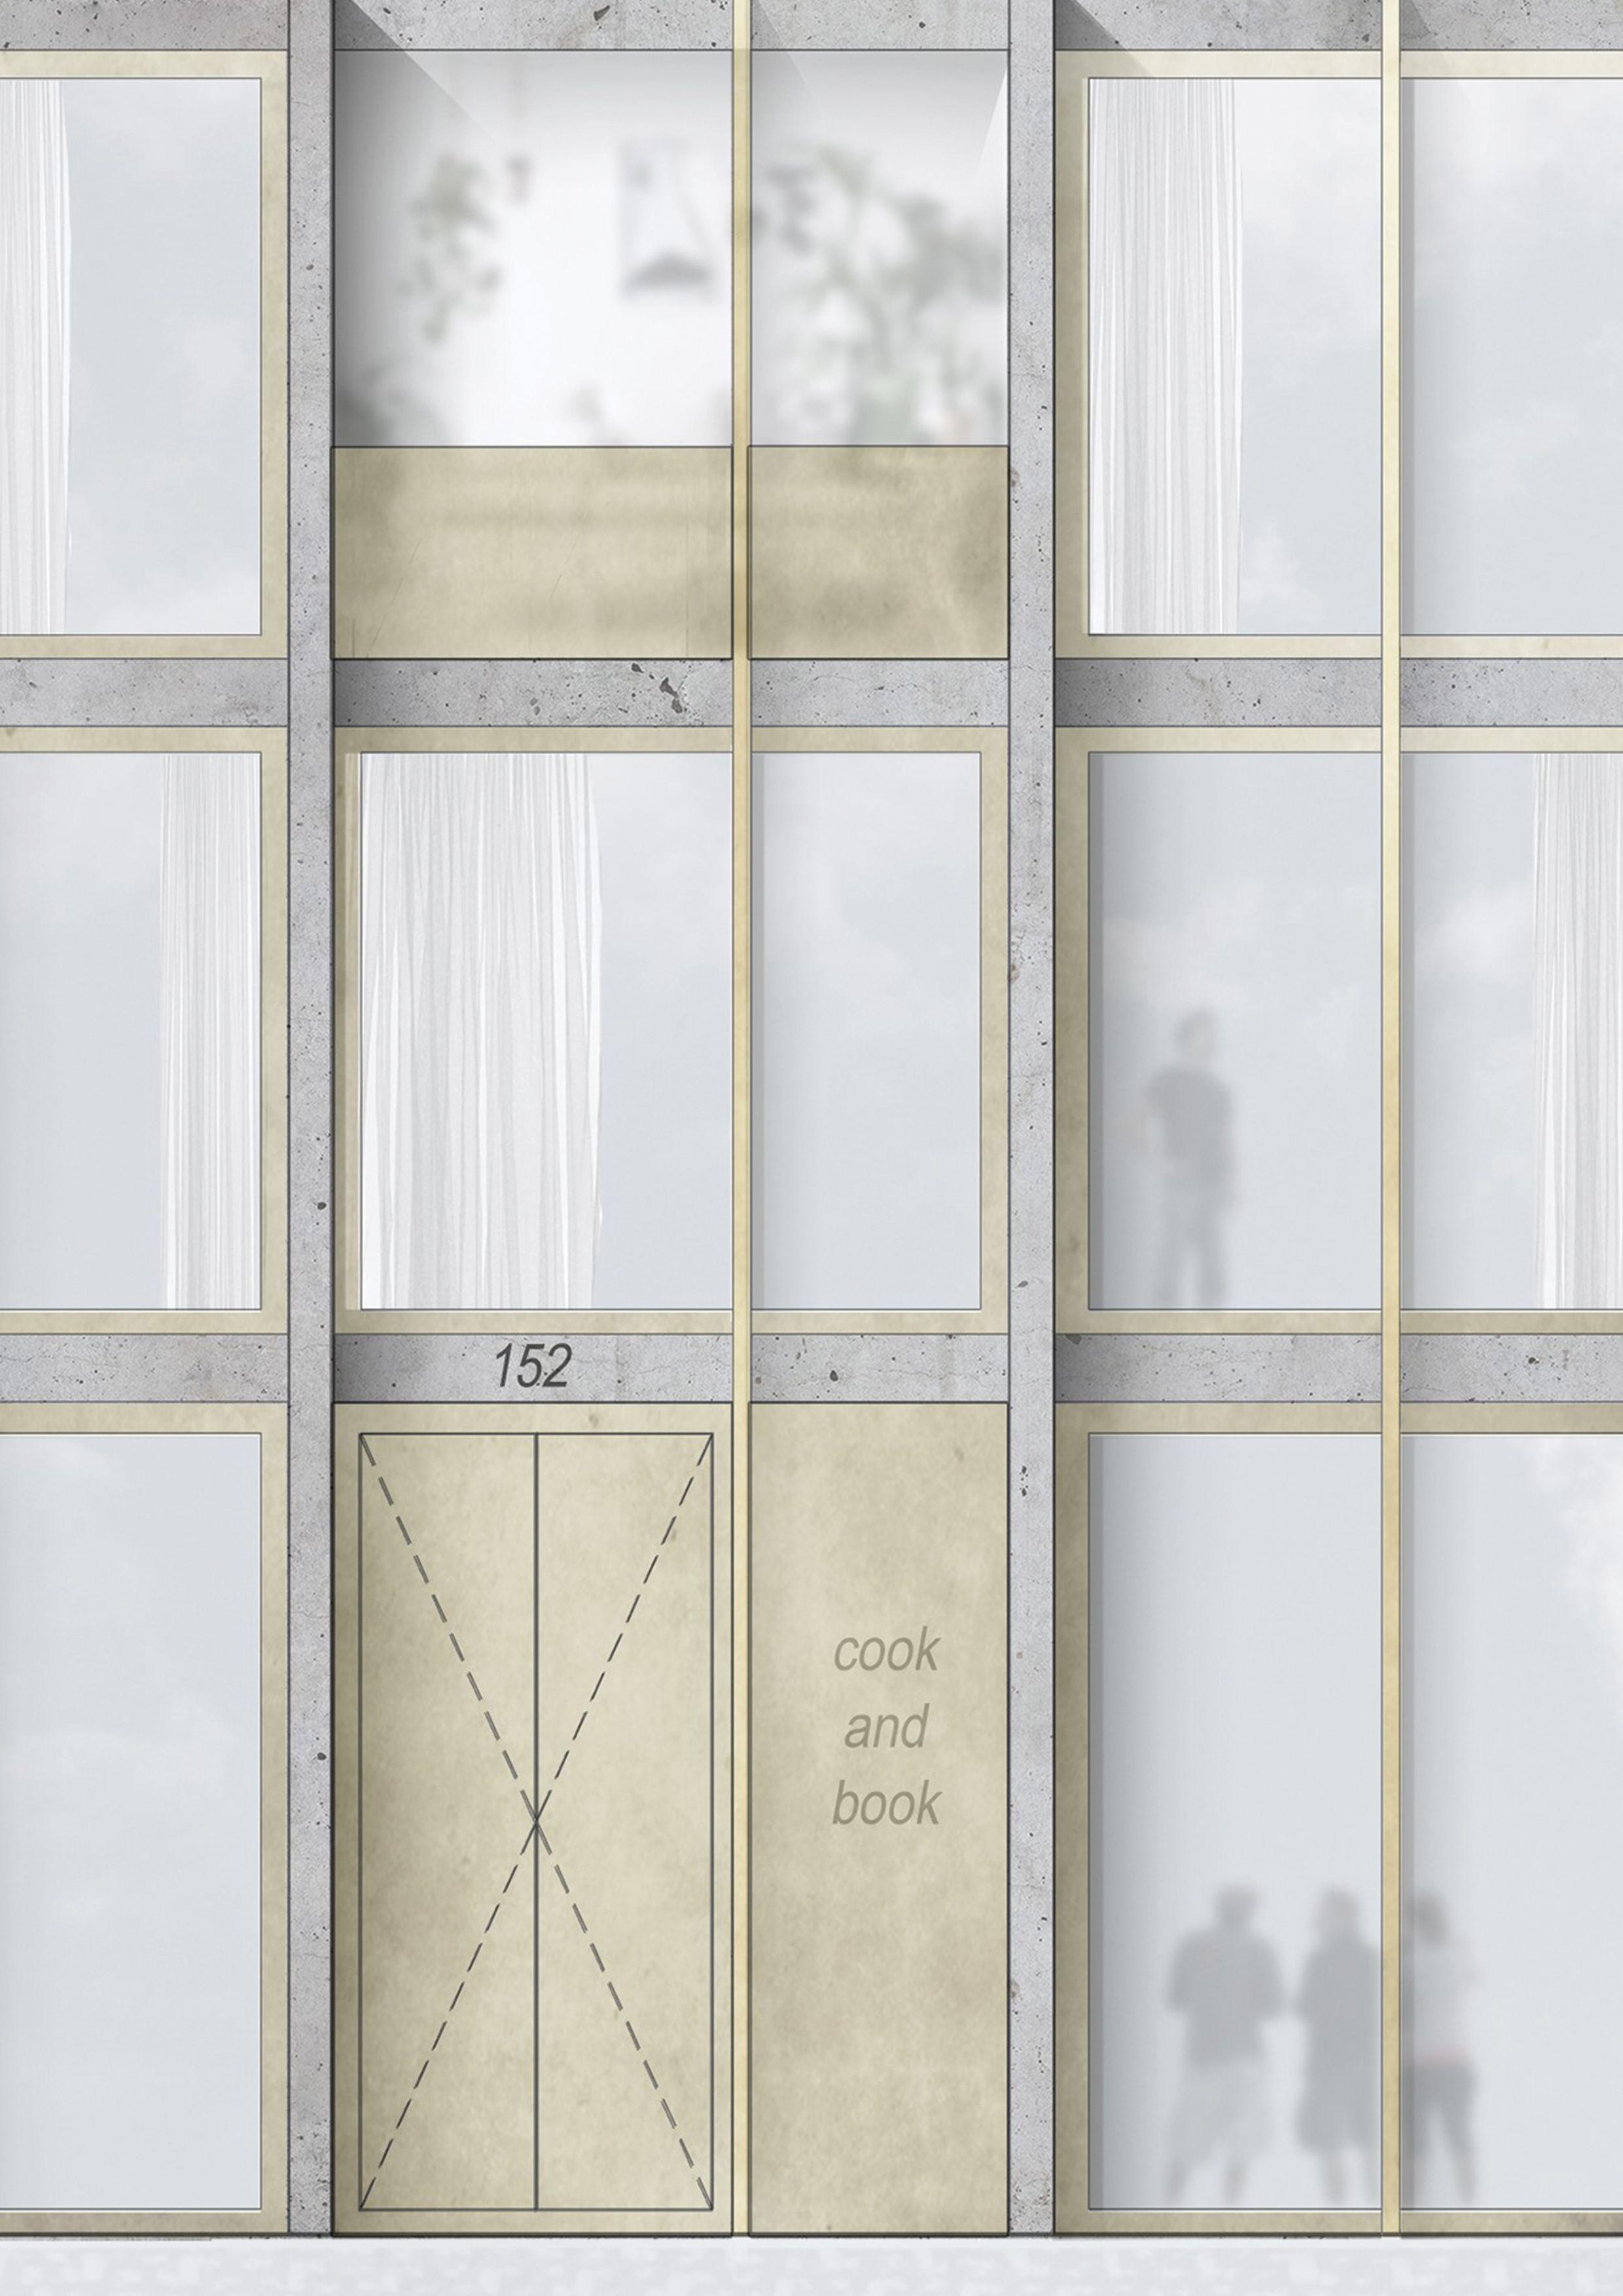 Concrete Housing Elevation Collage Johan Metzger La Cambre